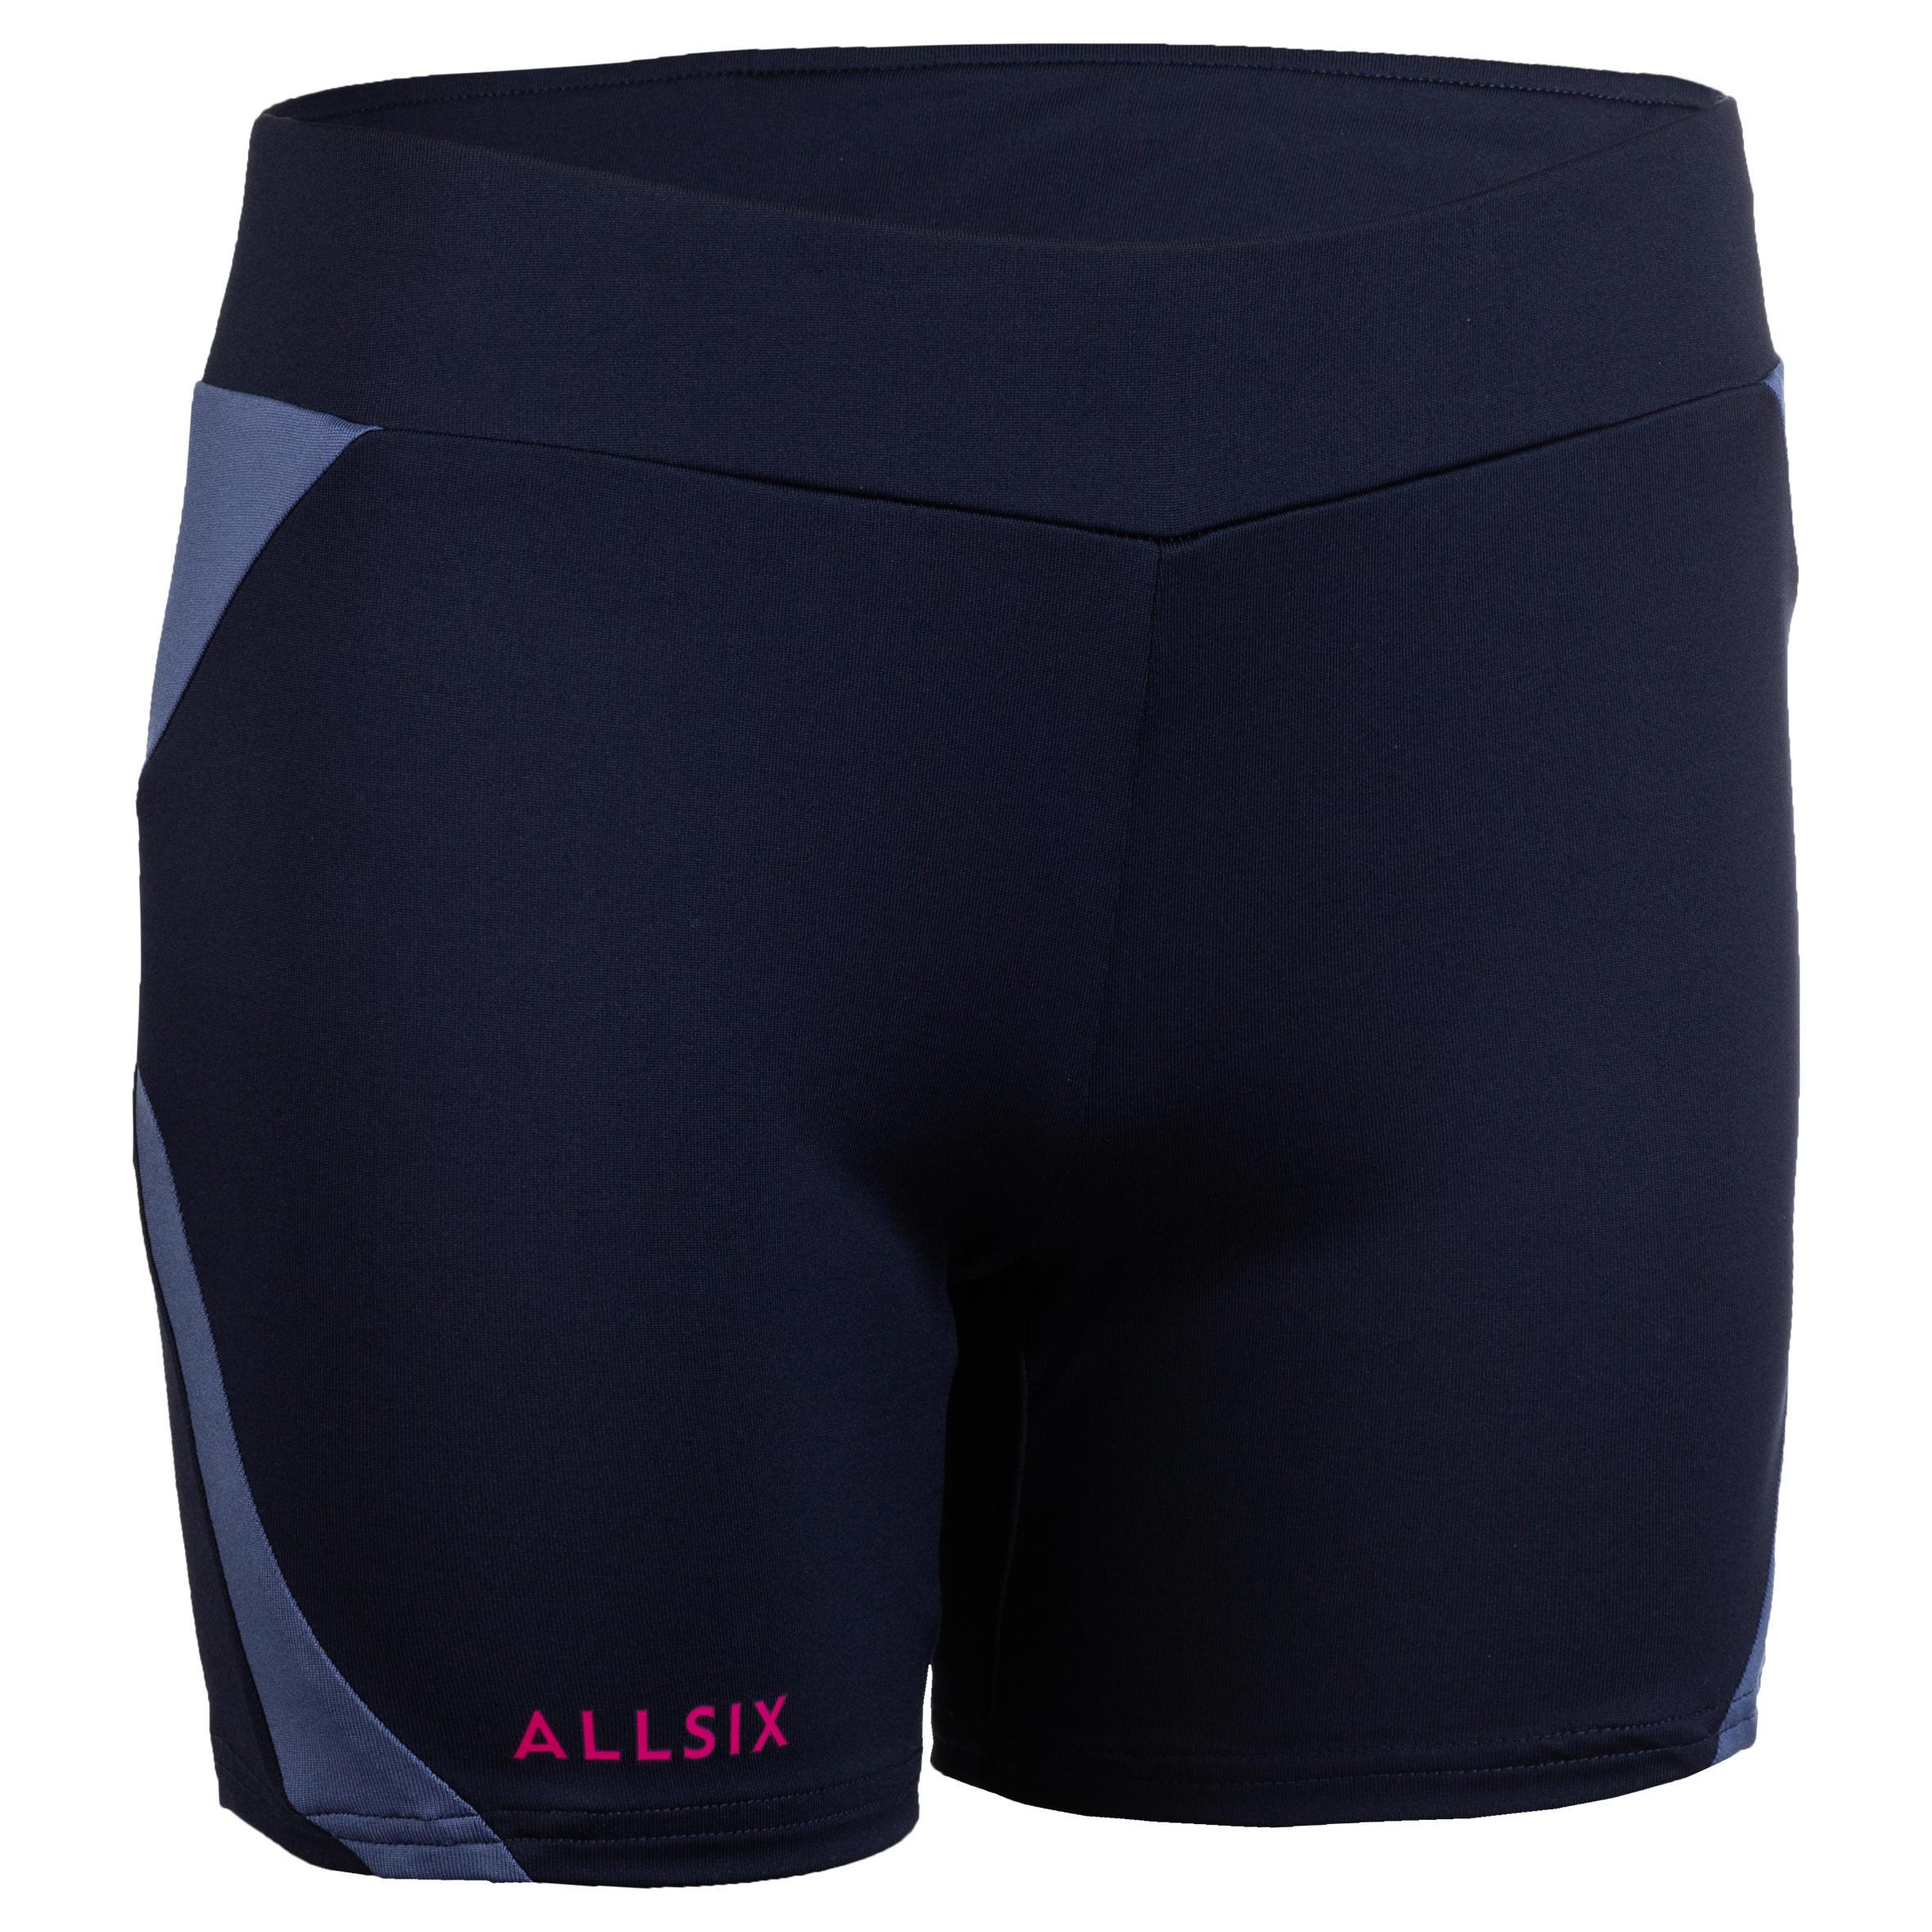 Allsix Volleybalbroekje dames V500 marineblauw